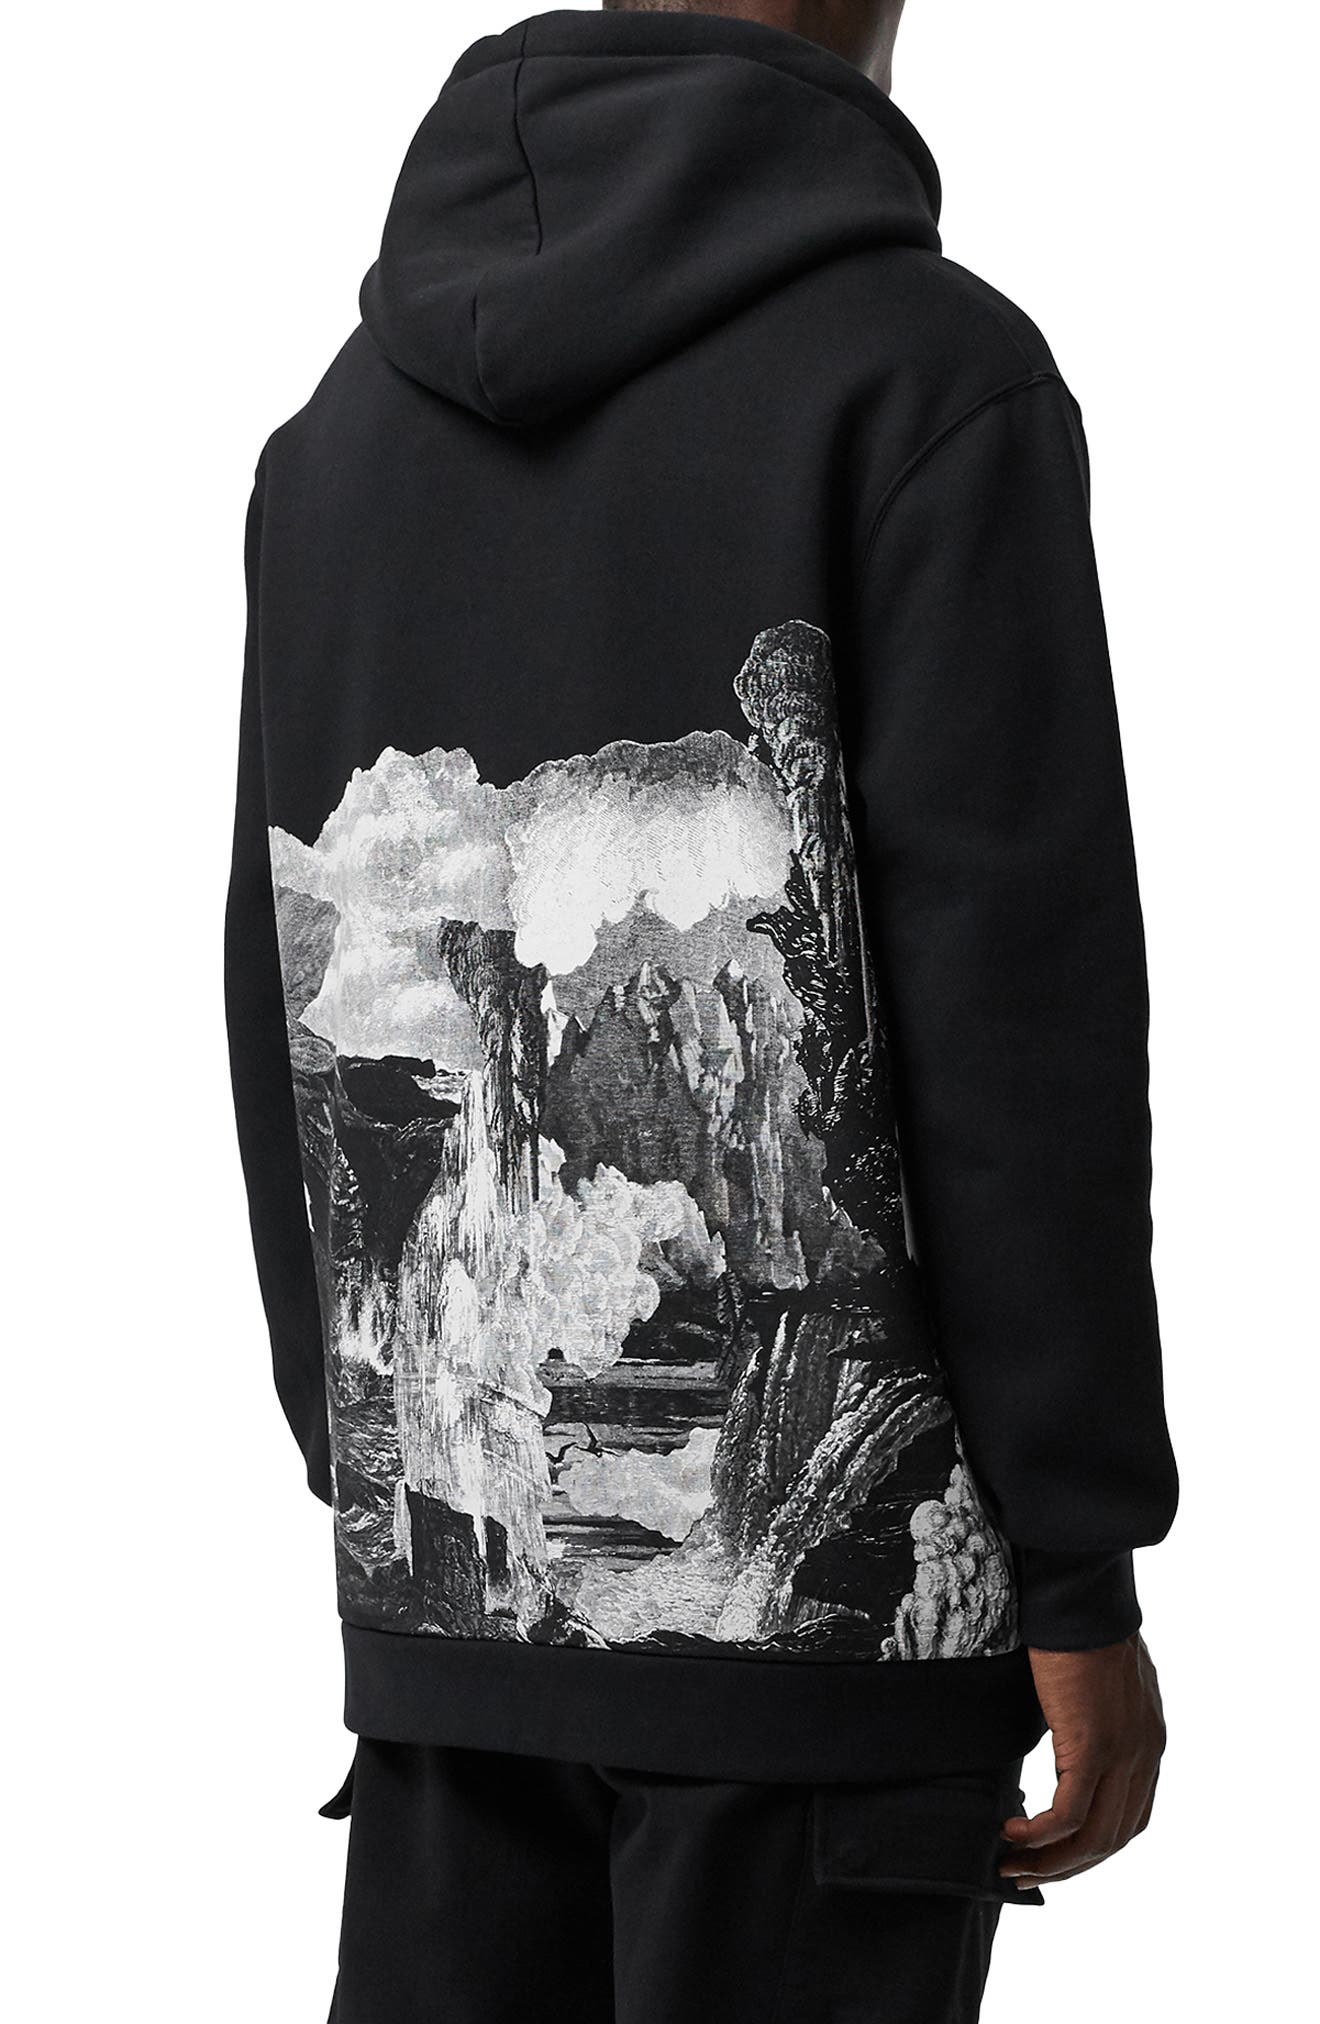 BURBERRY Dreamscape Print Hooded Sweatshirt, Main, color, BLACK